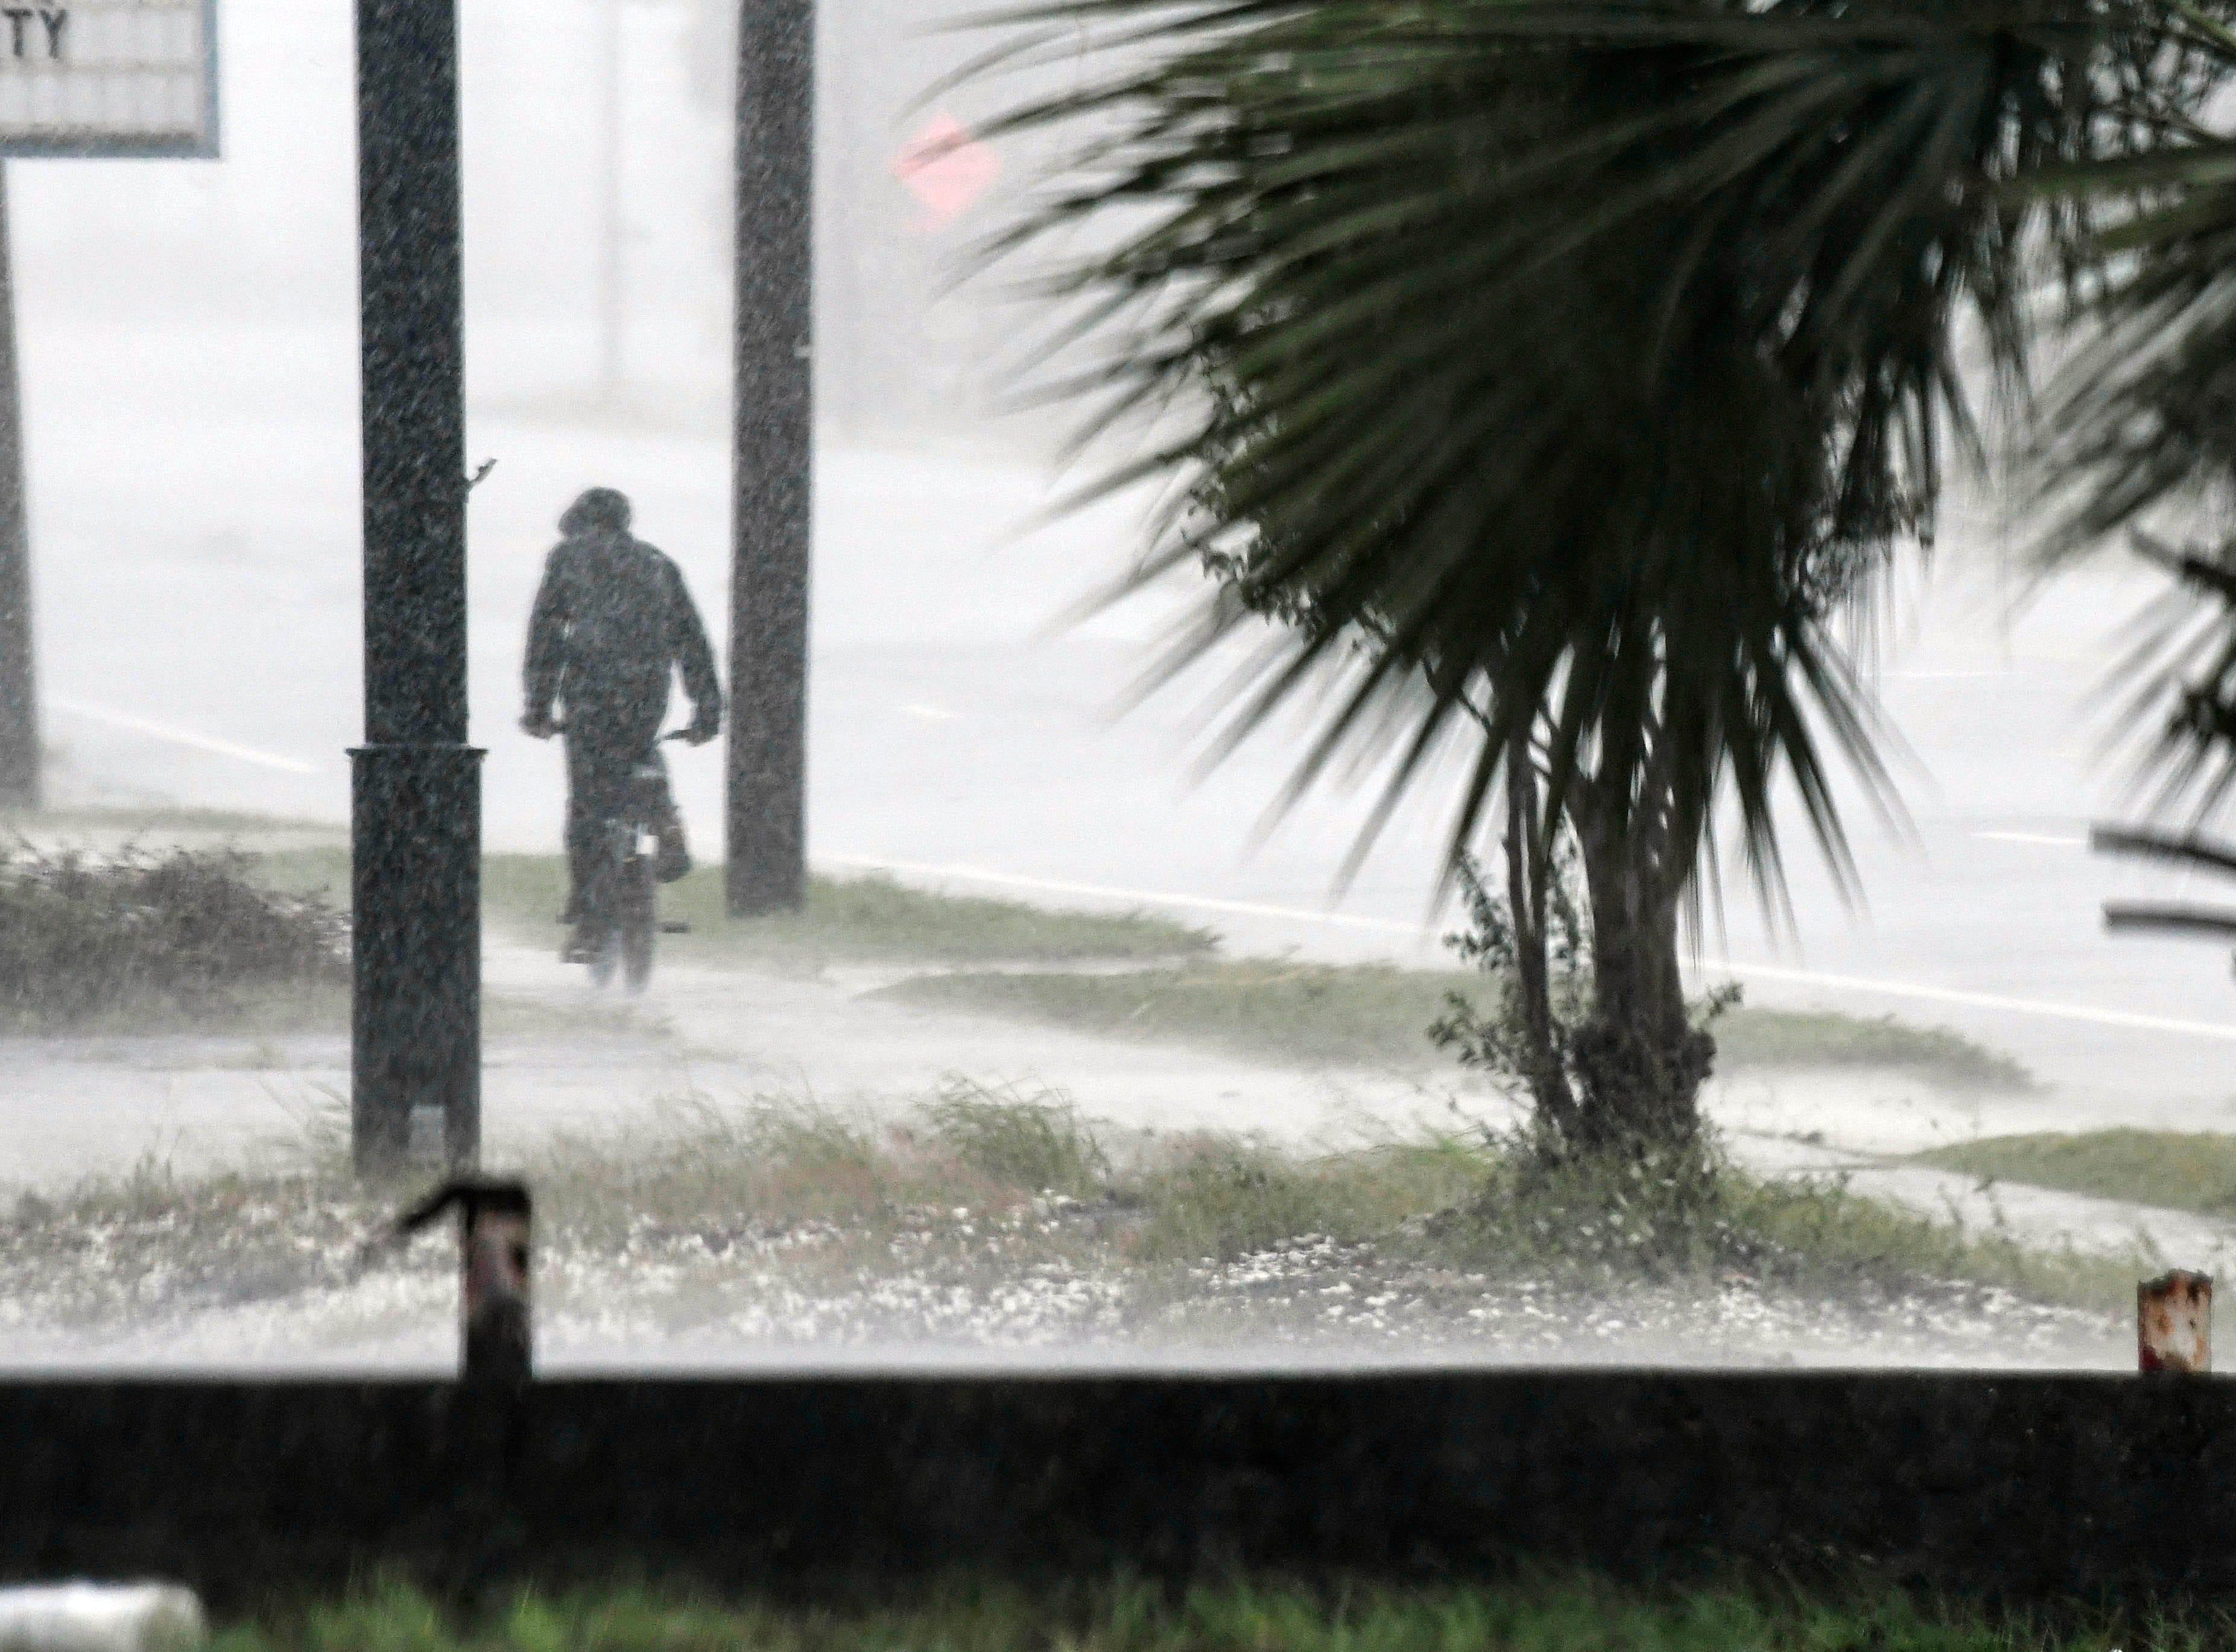 Oct 10, 2018; Panama City, FL, USA; A bicyclist braves the rain as Hurricane Michael approaches Panama City, FL.